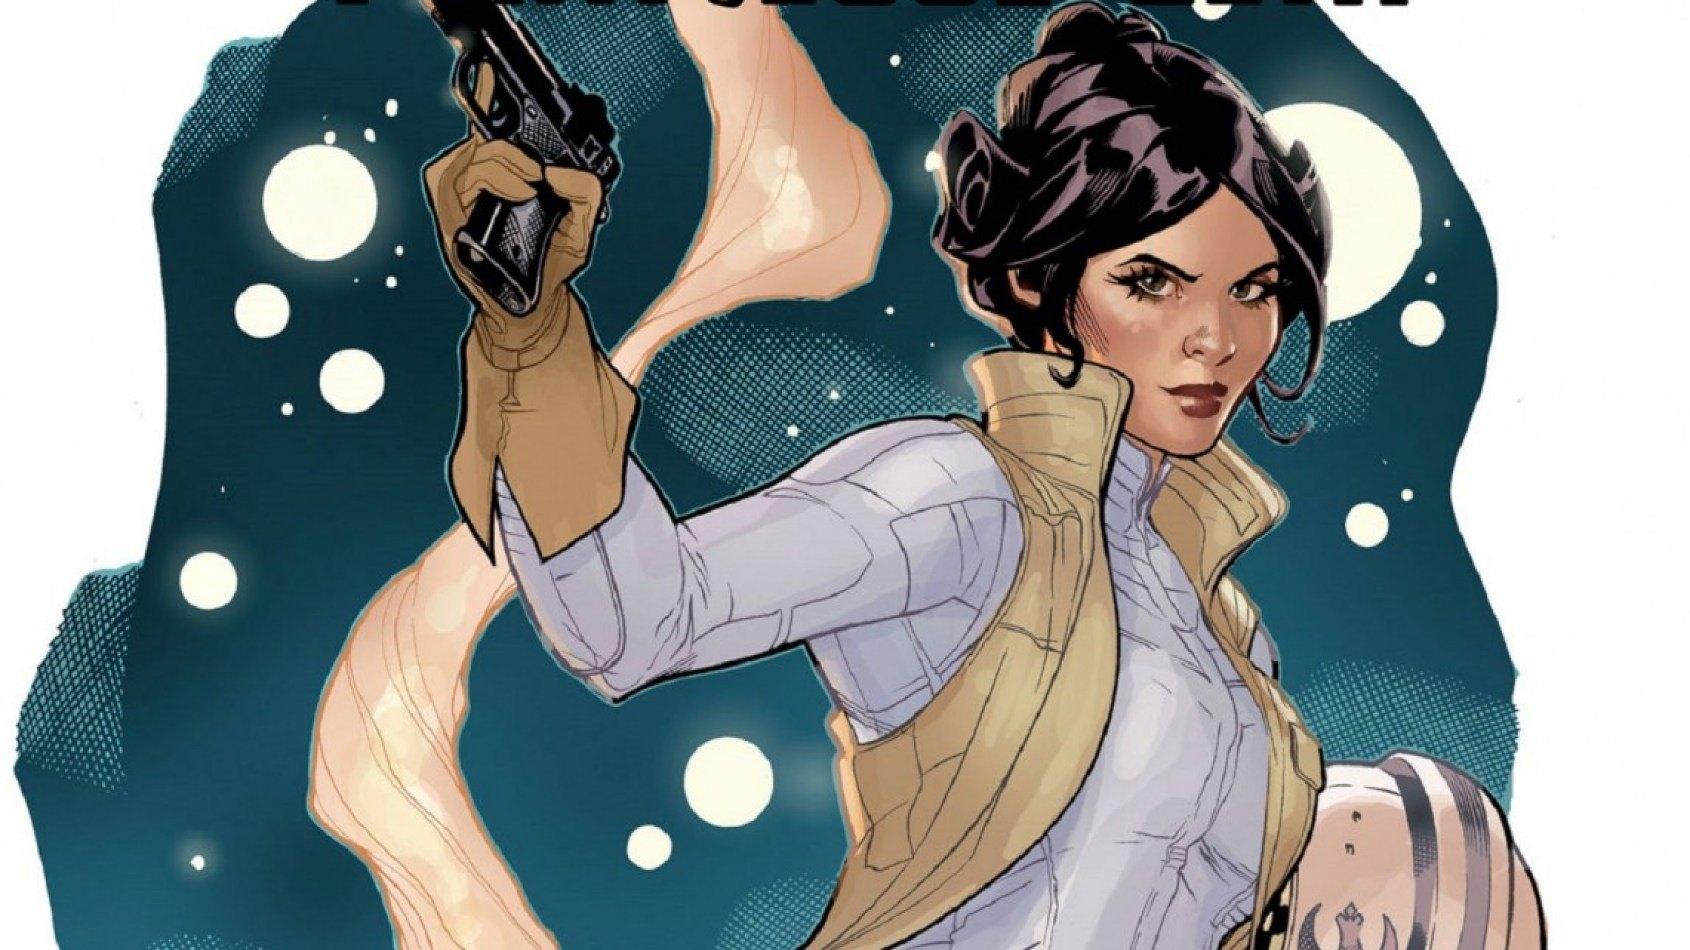 [Panini] La couverture de Princesse Leia